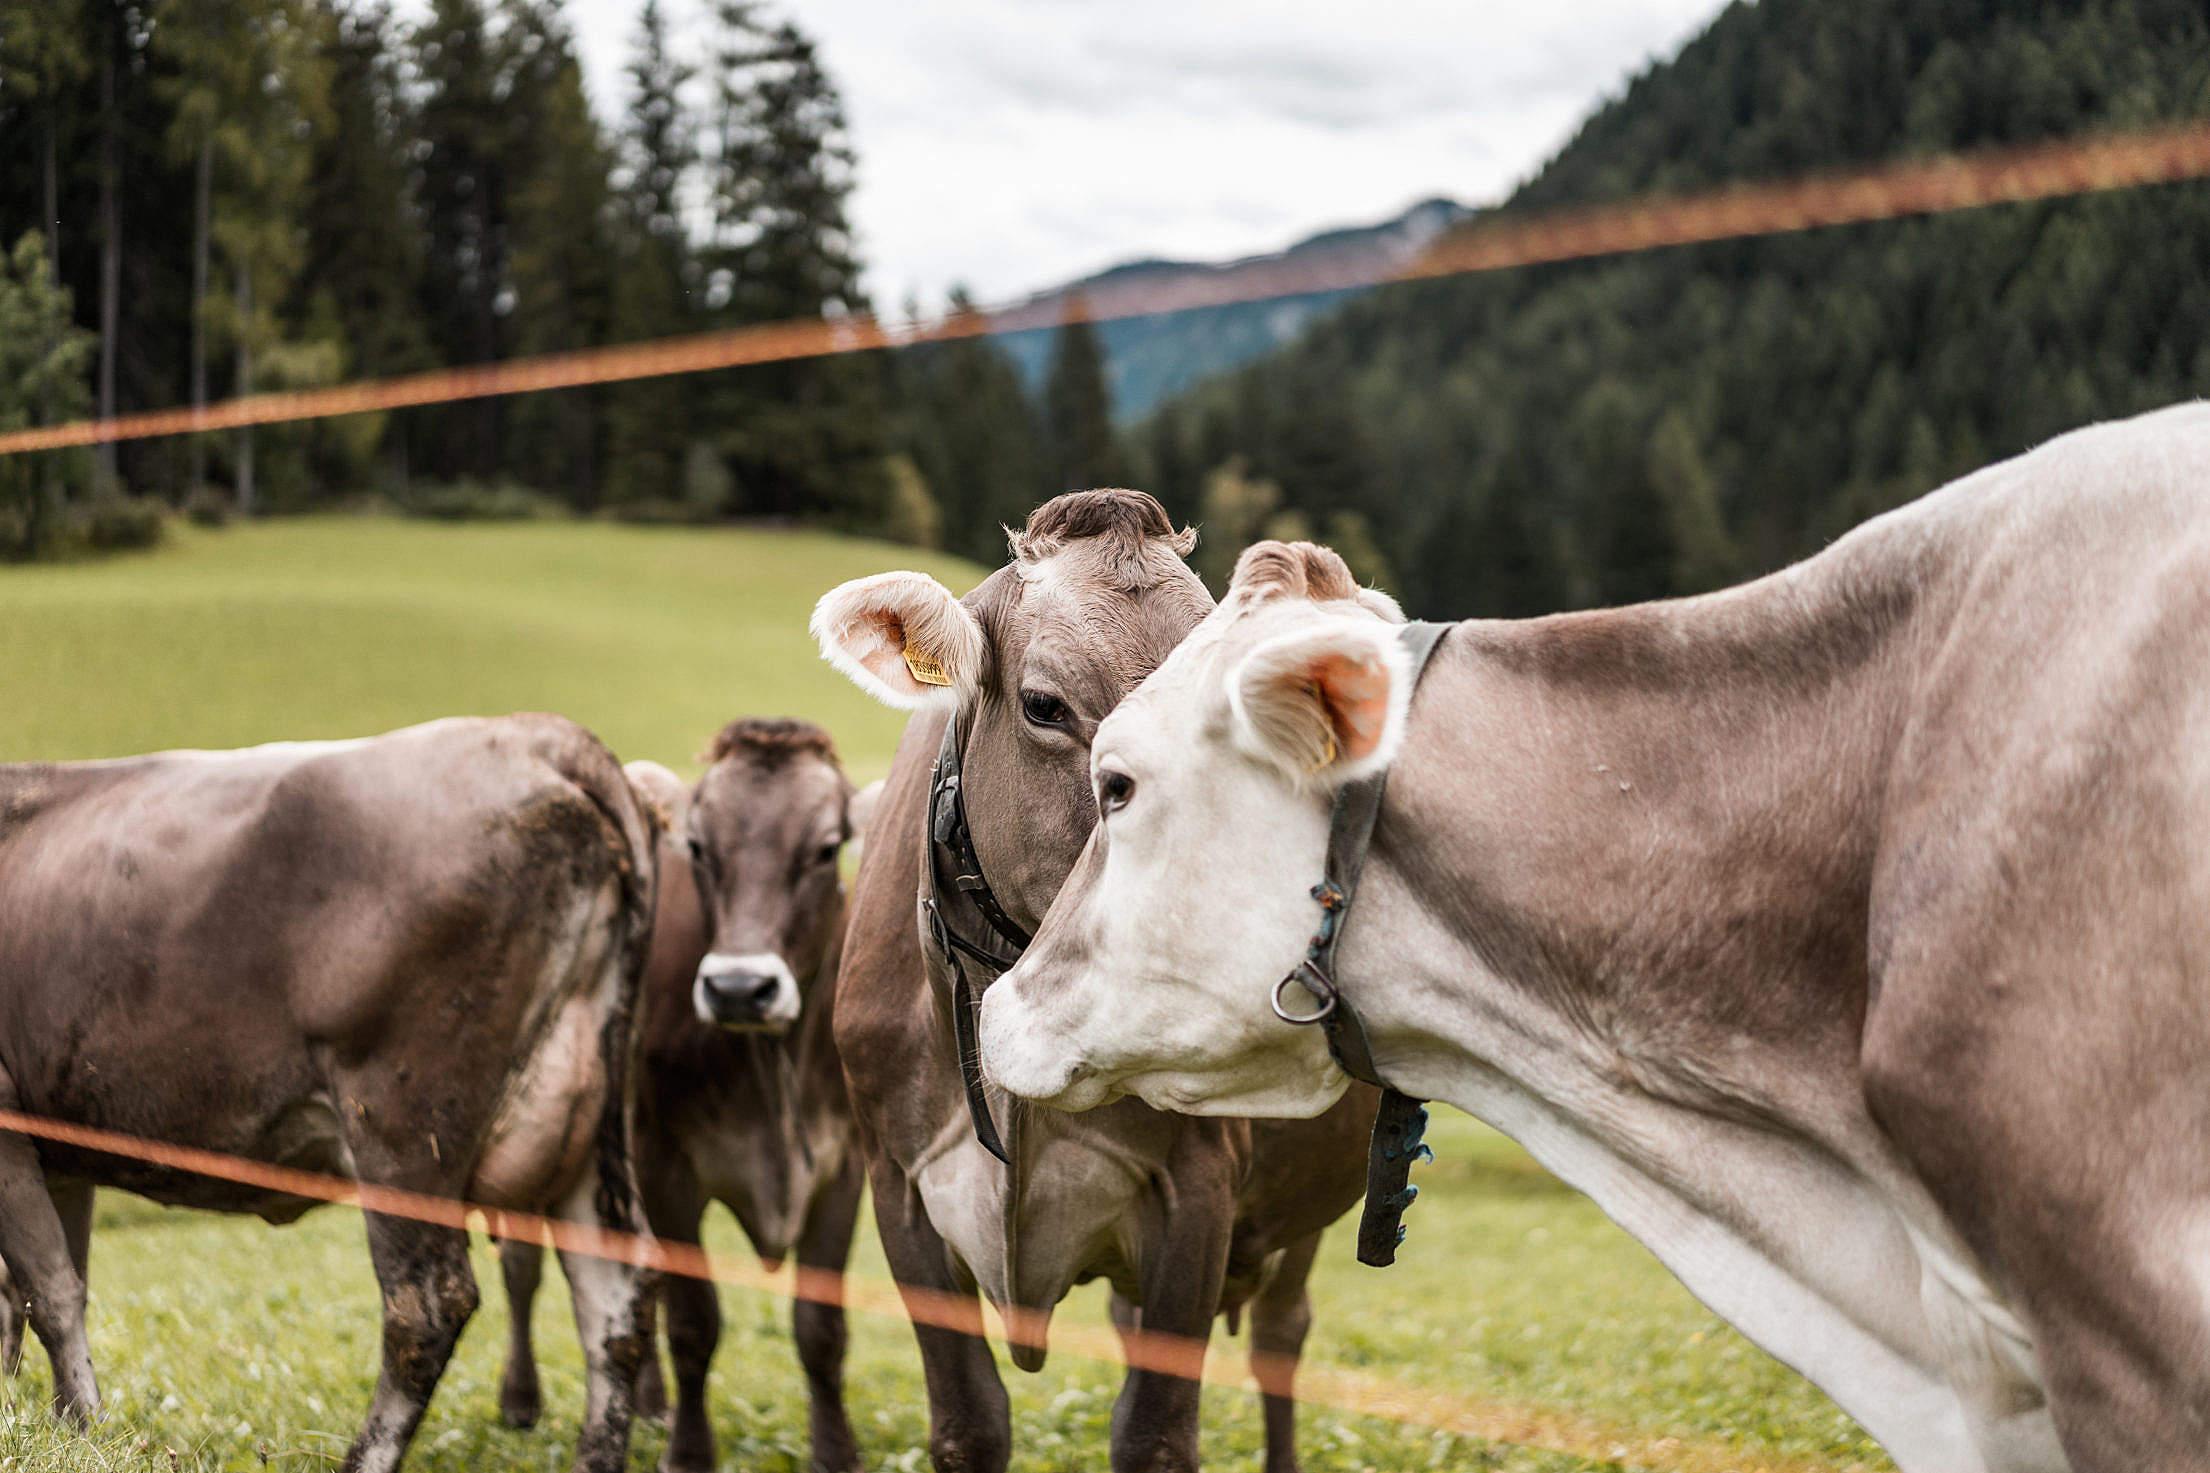 Herd of Cows Free Stock Photo